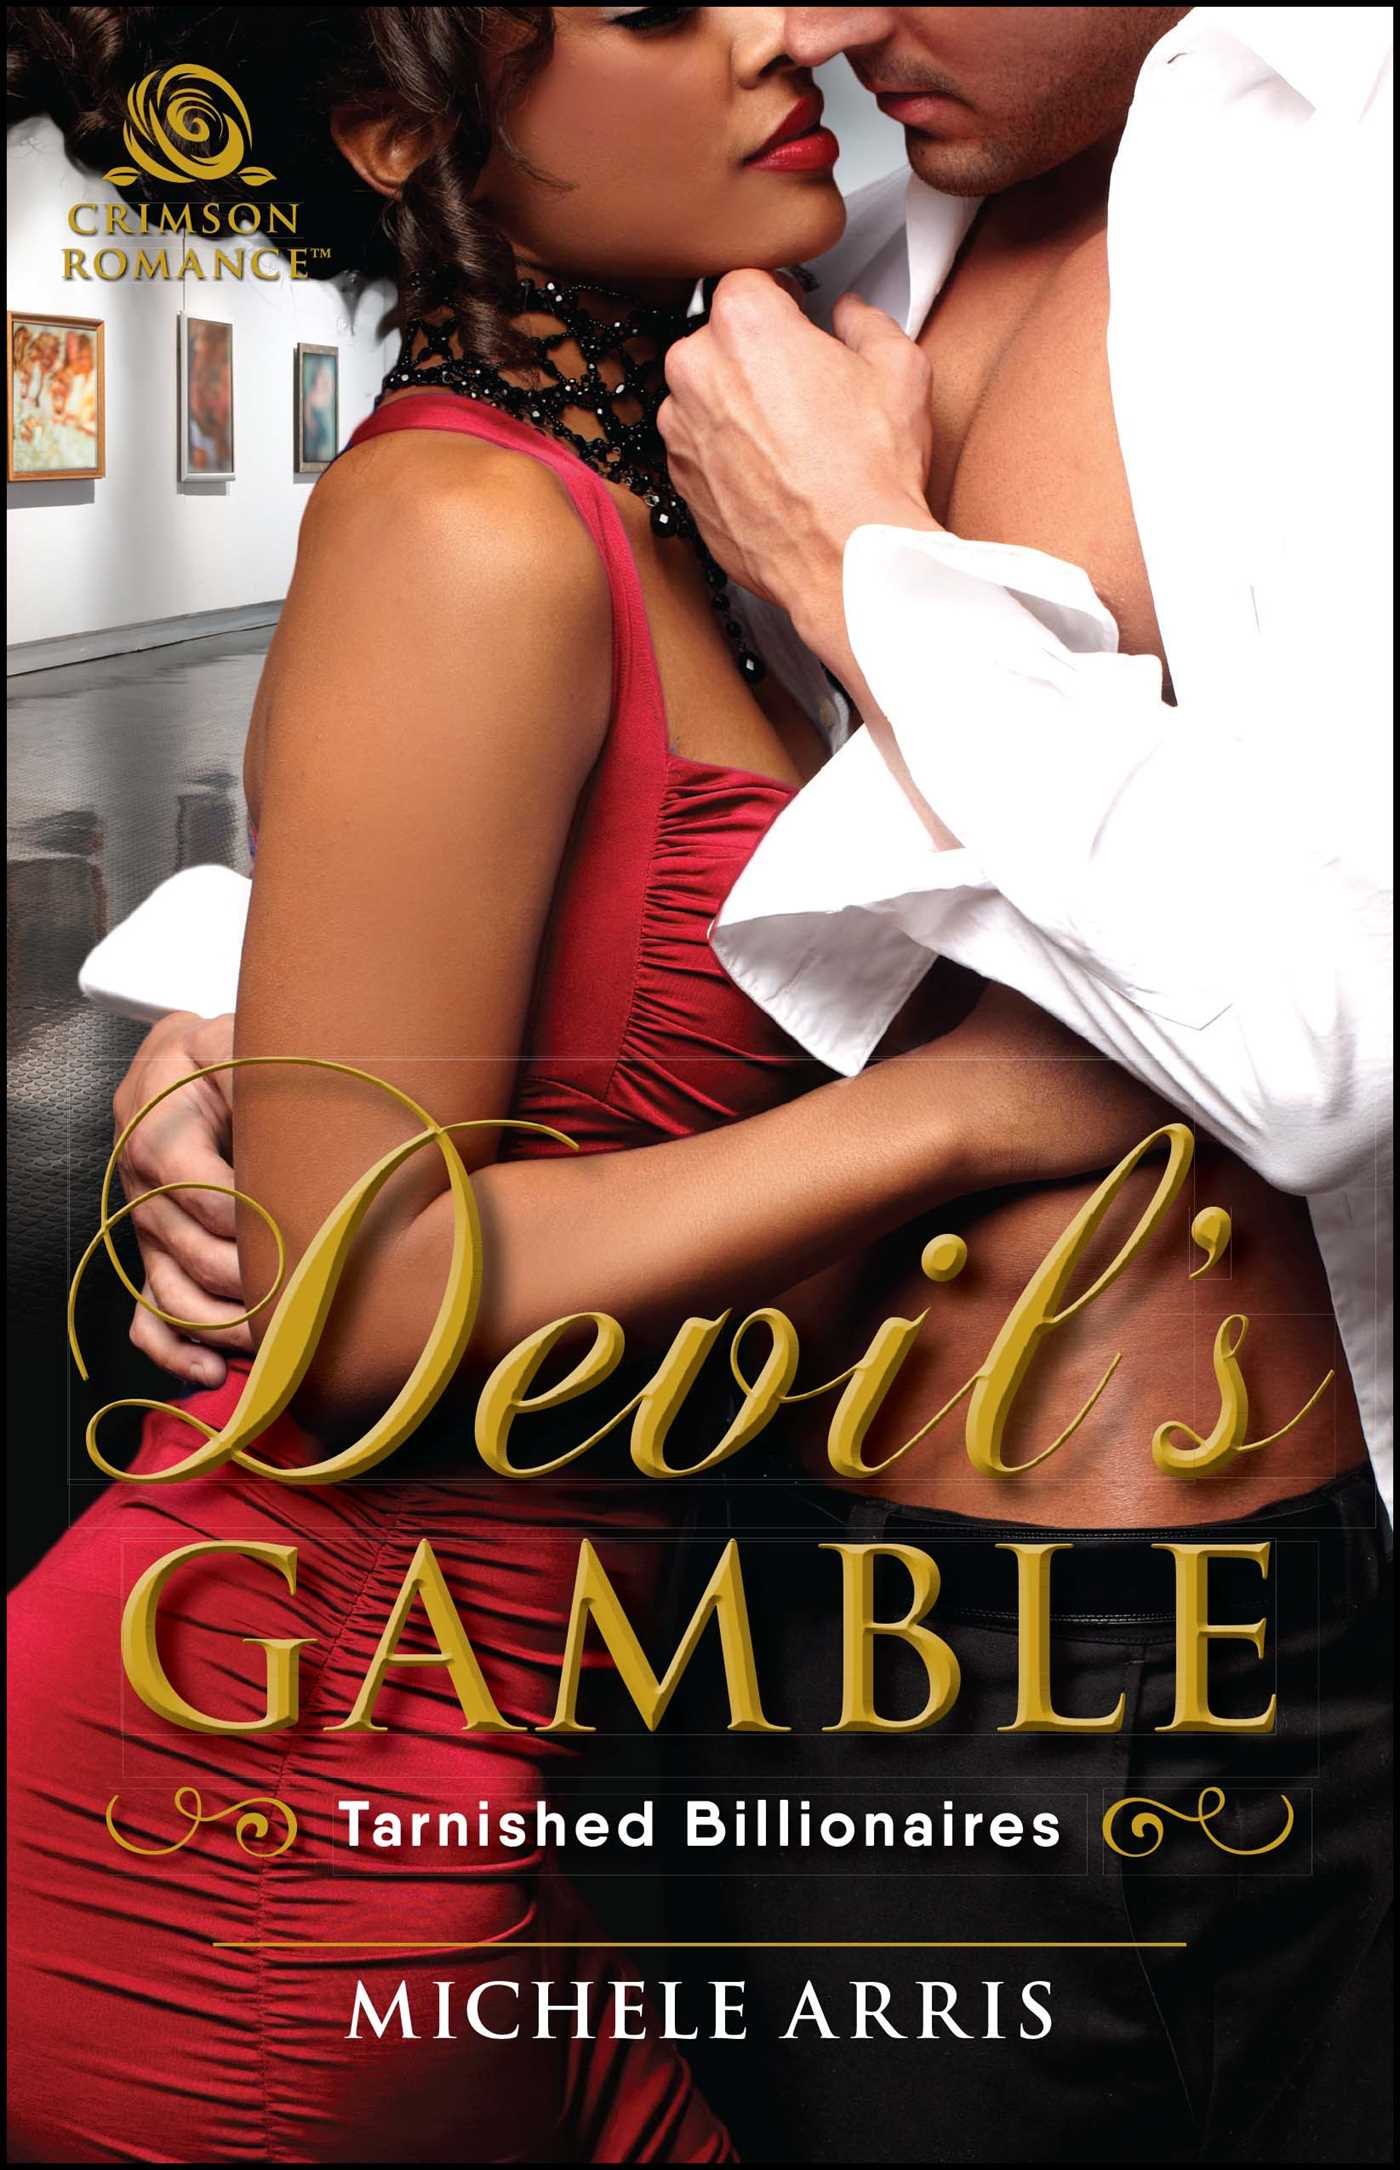 Devils gamble 9781507207048 hr